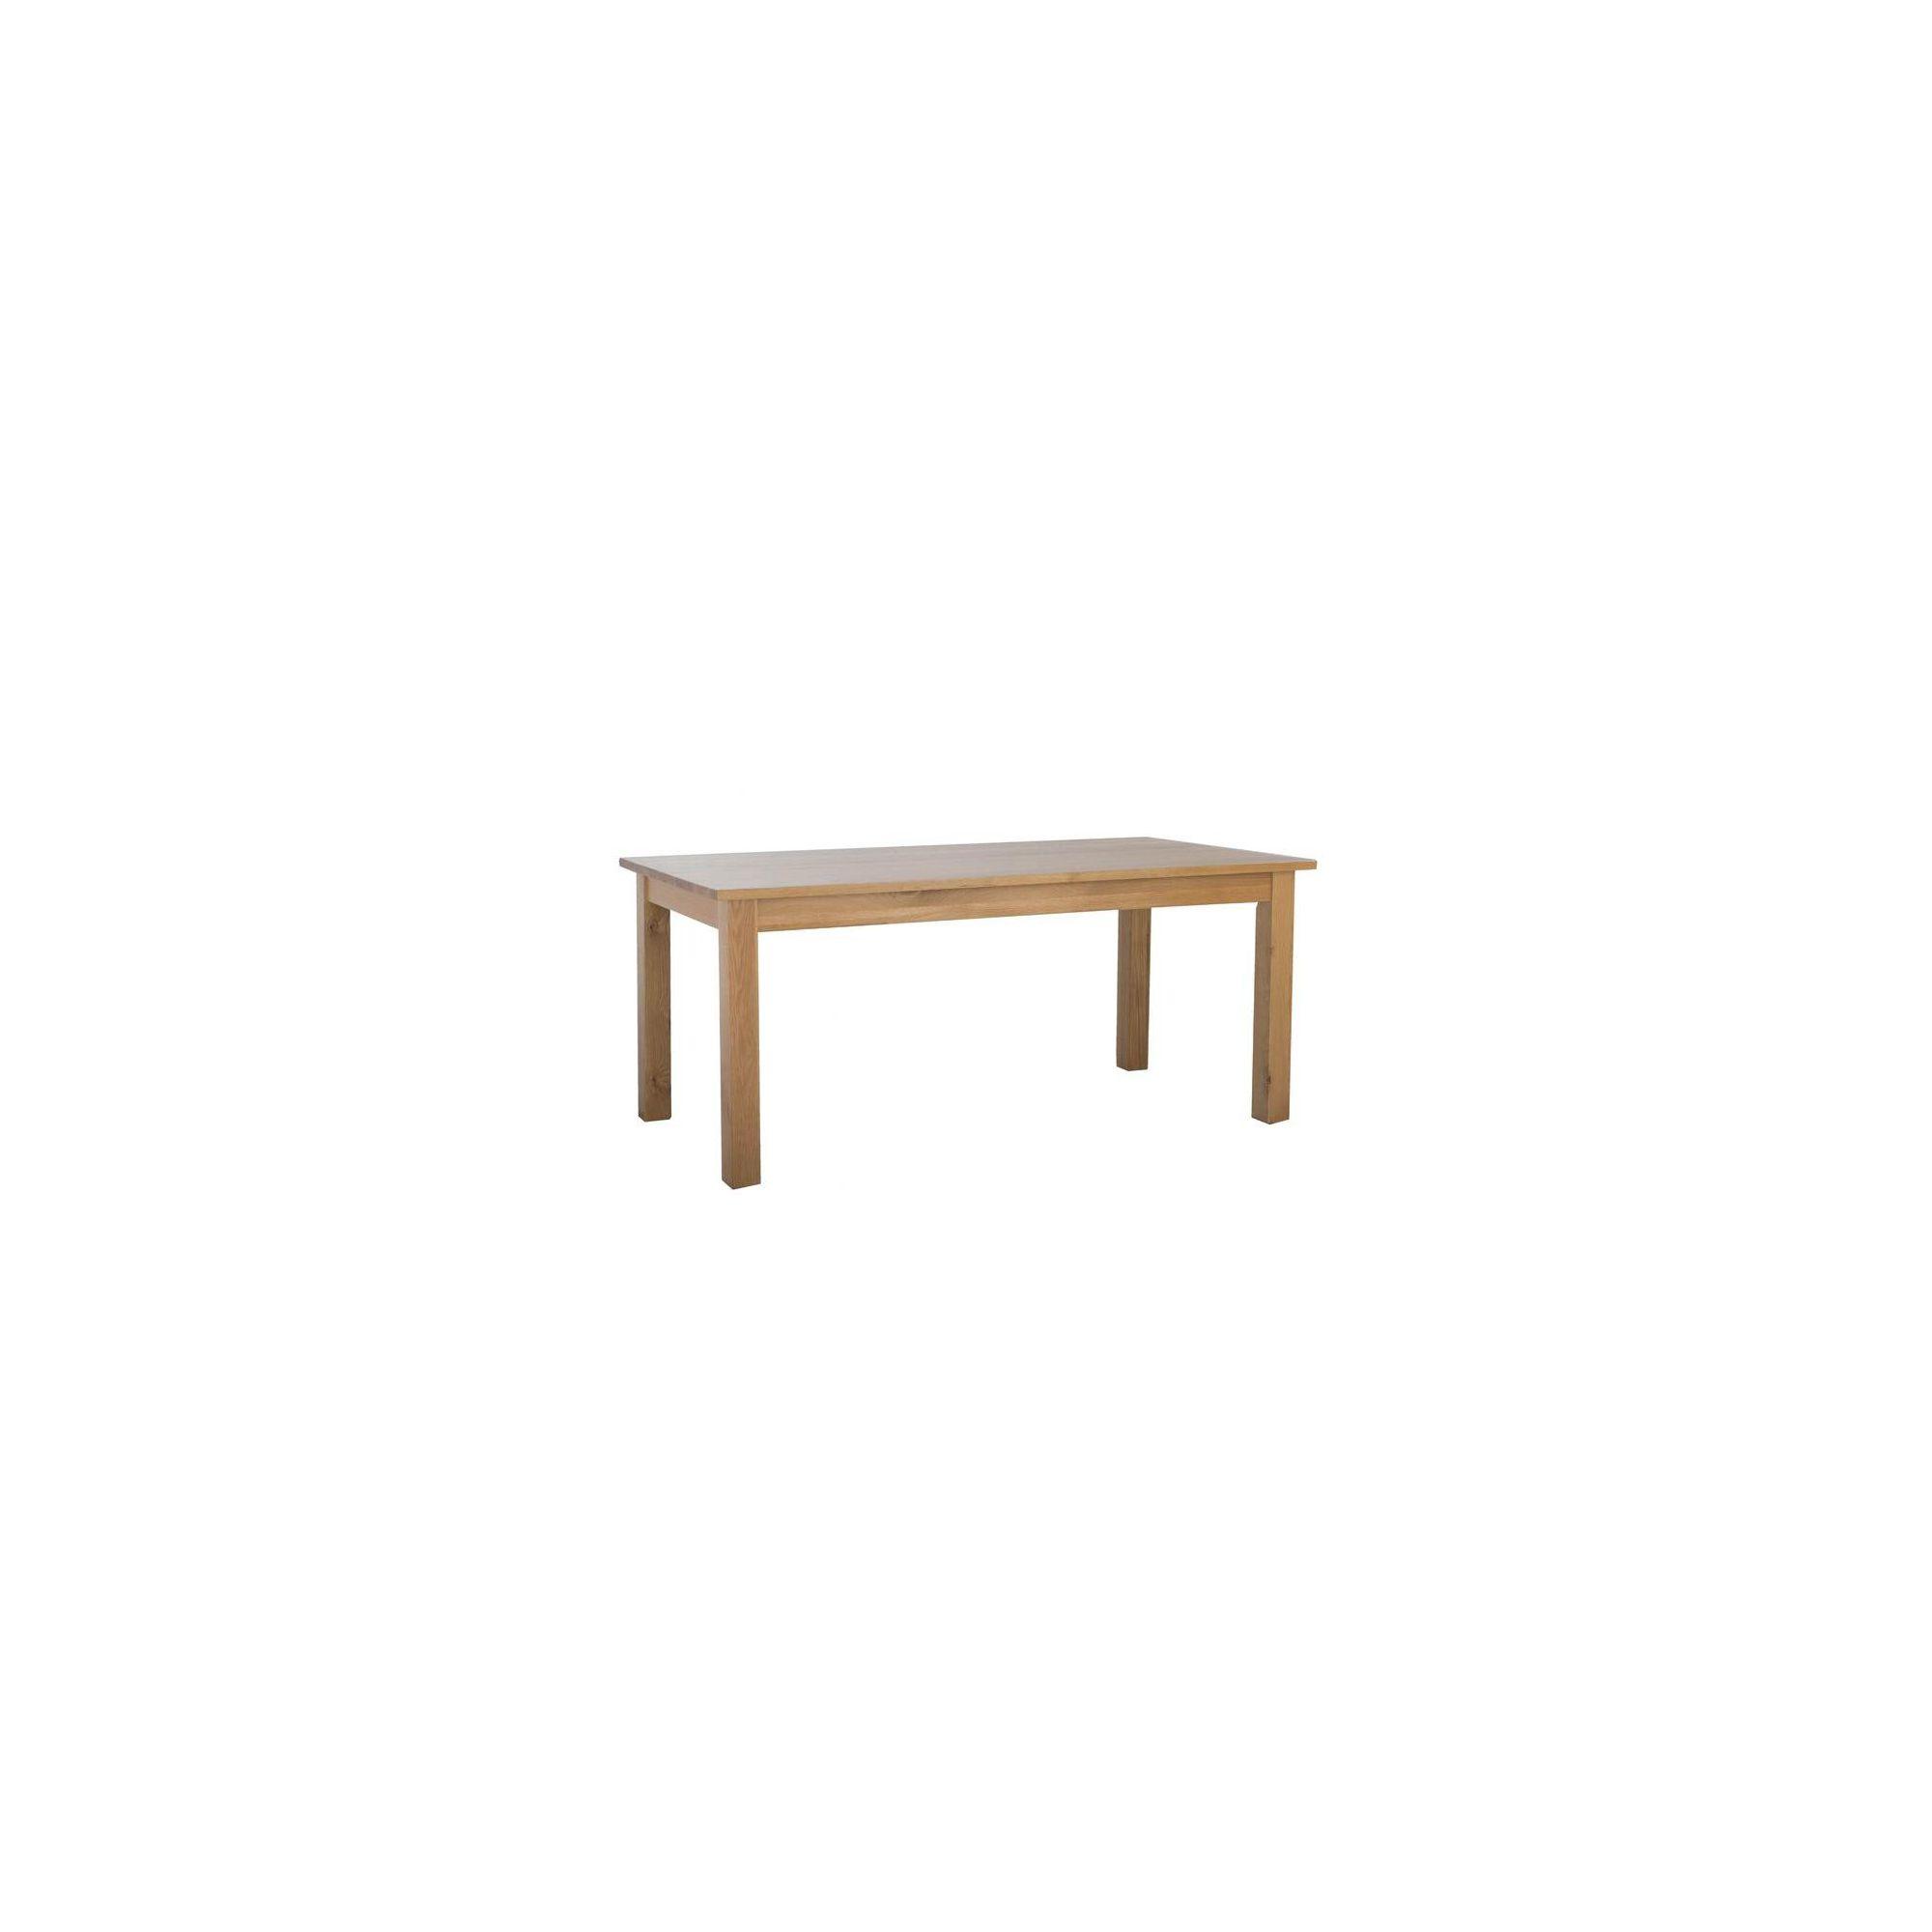 Oakinsen Balmain 180cm Dining Table